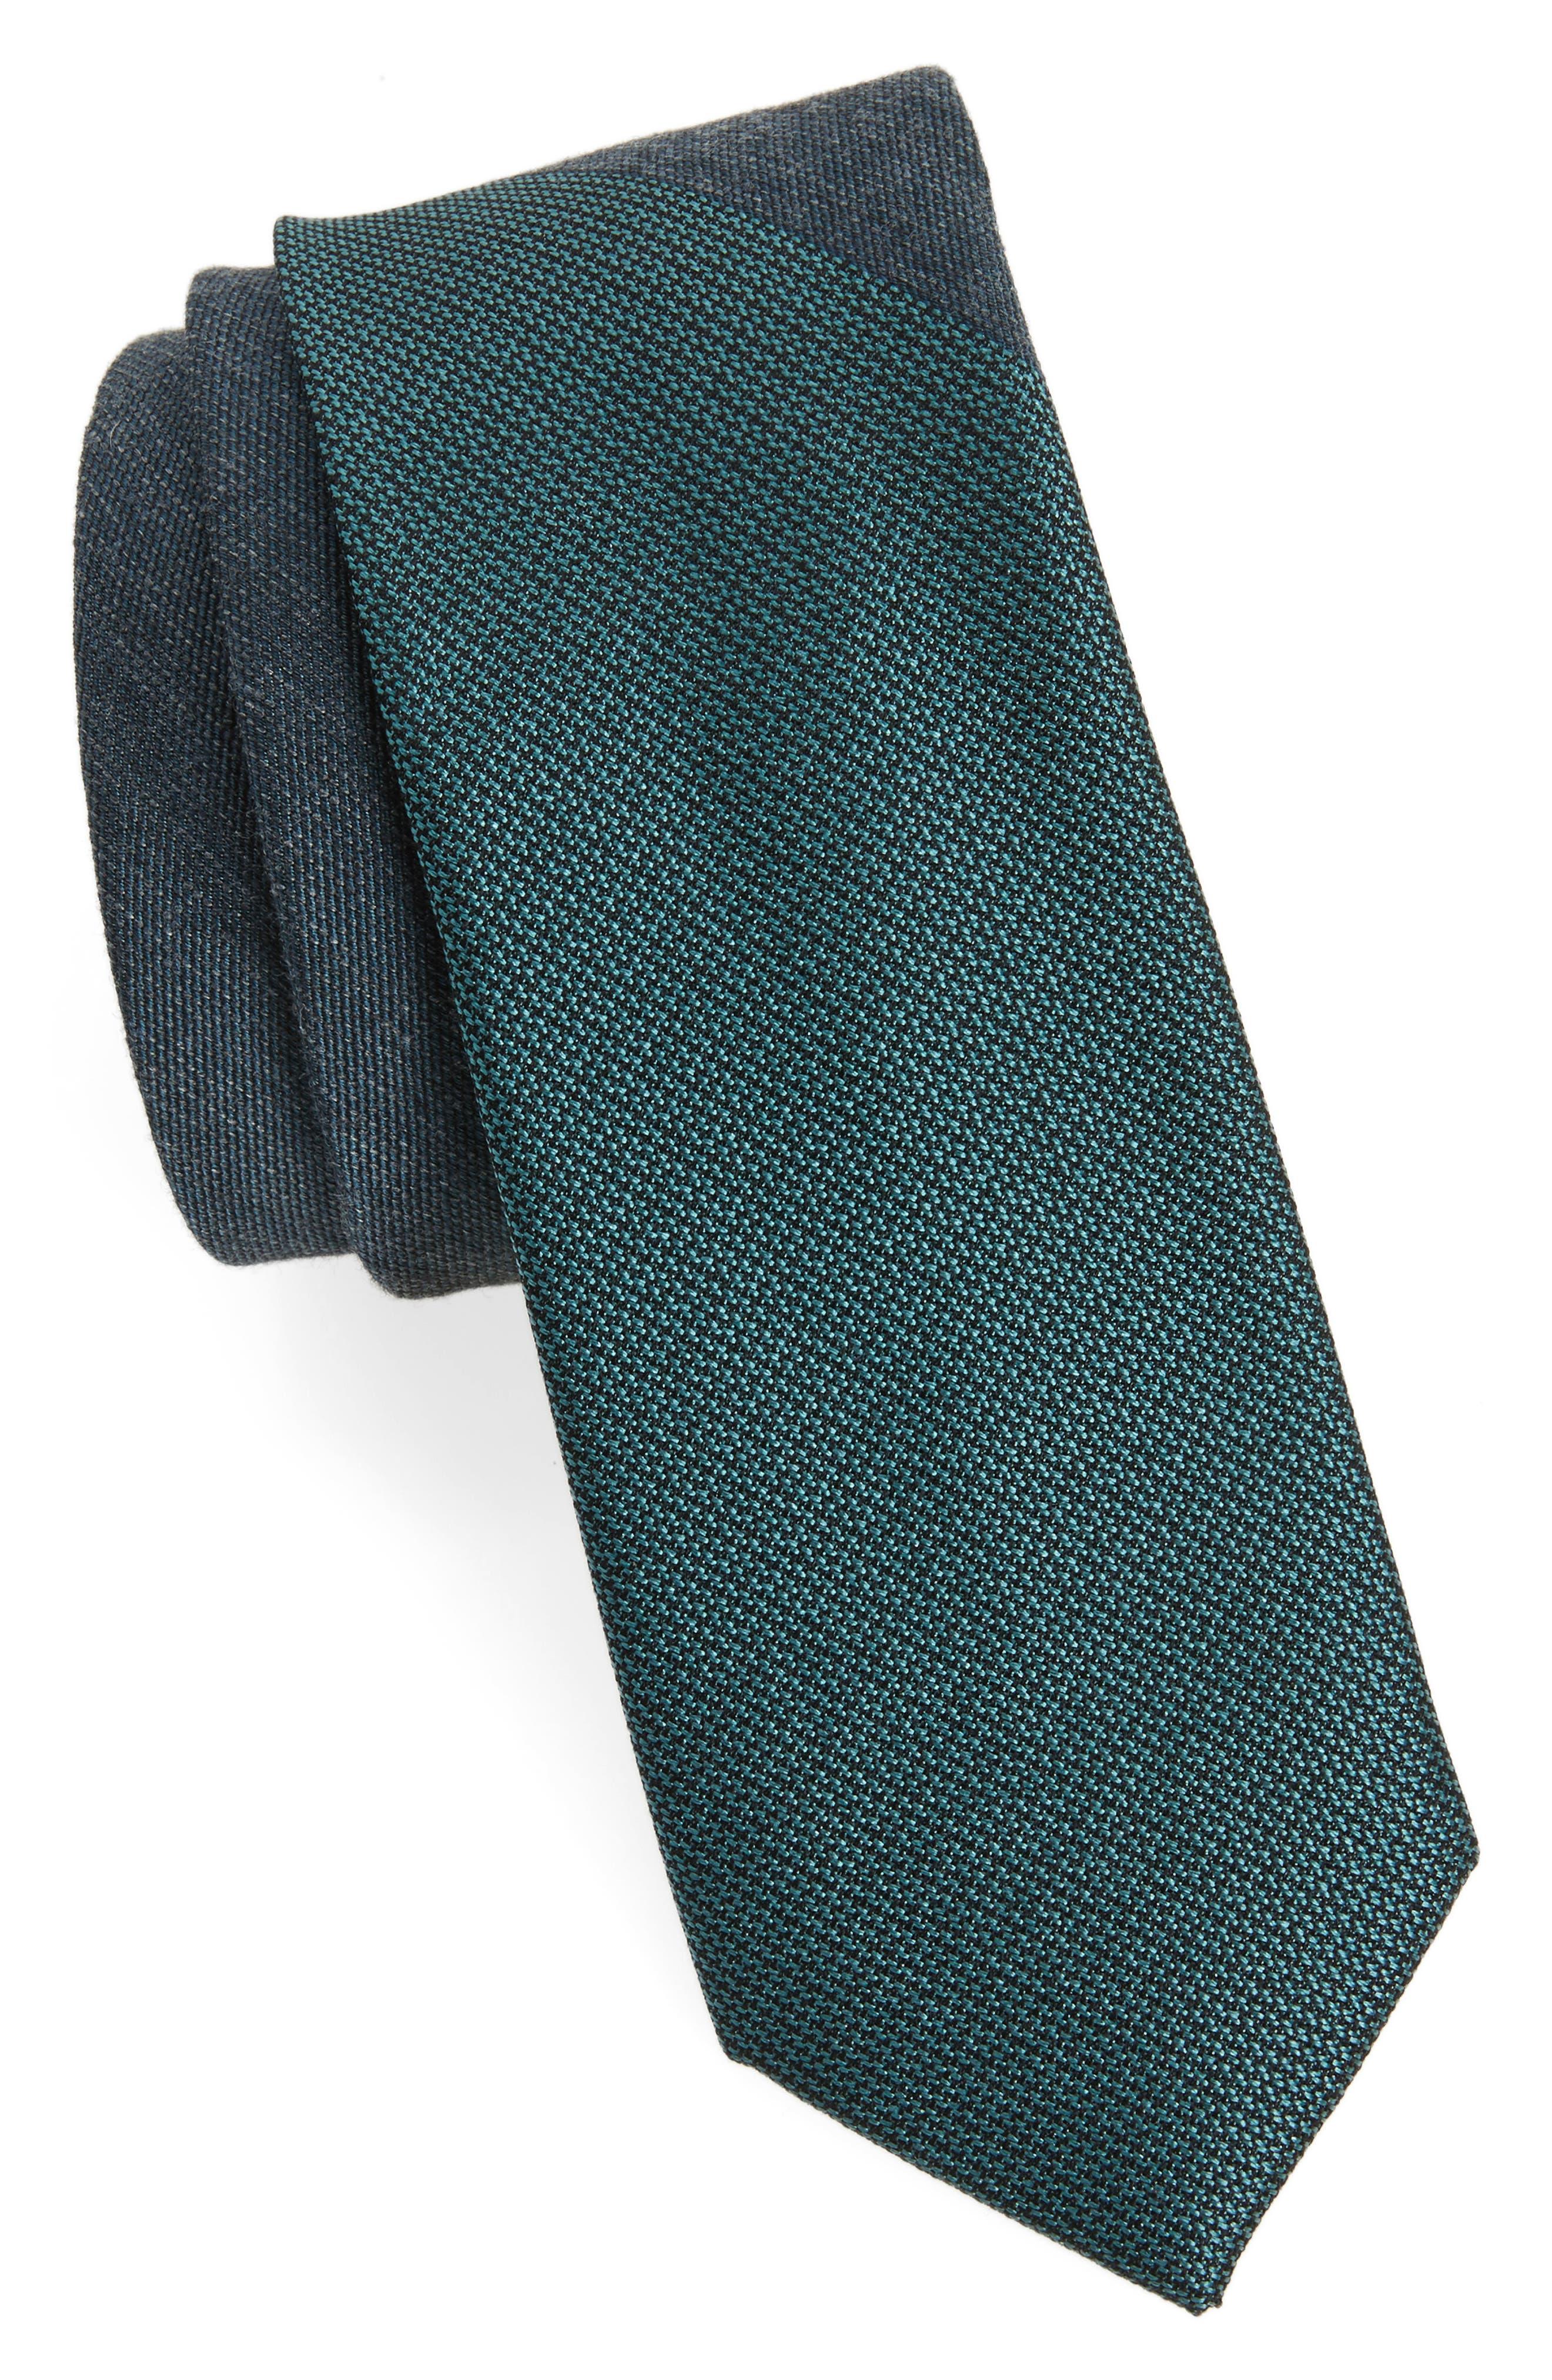 Half & Half Panel Tie,                             Main thumbnail 1, color,                             Teal